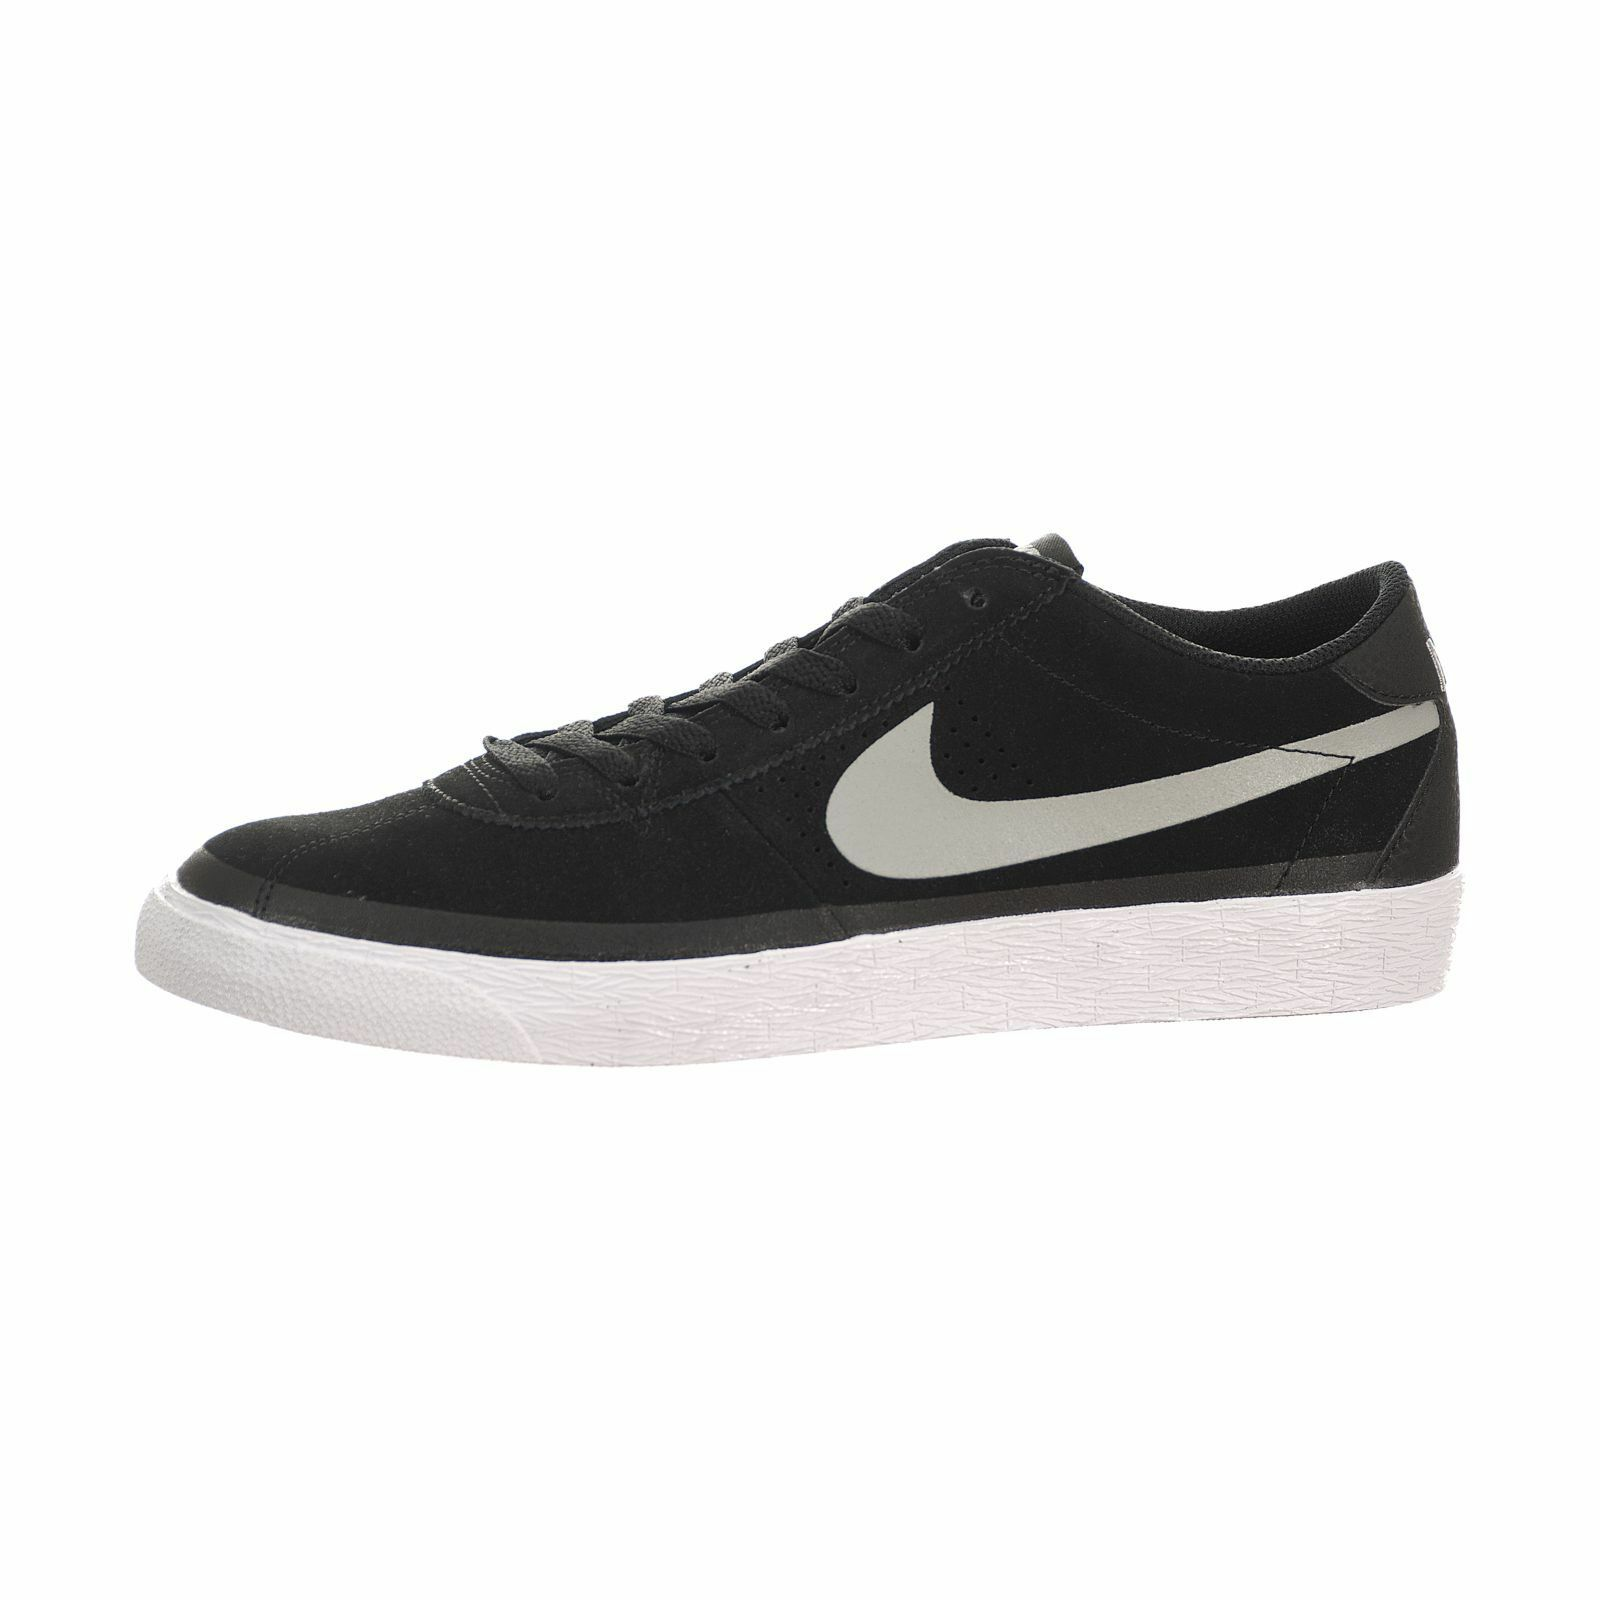 Nike SB Bruin Premium 631041-001